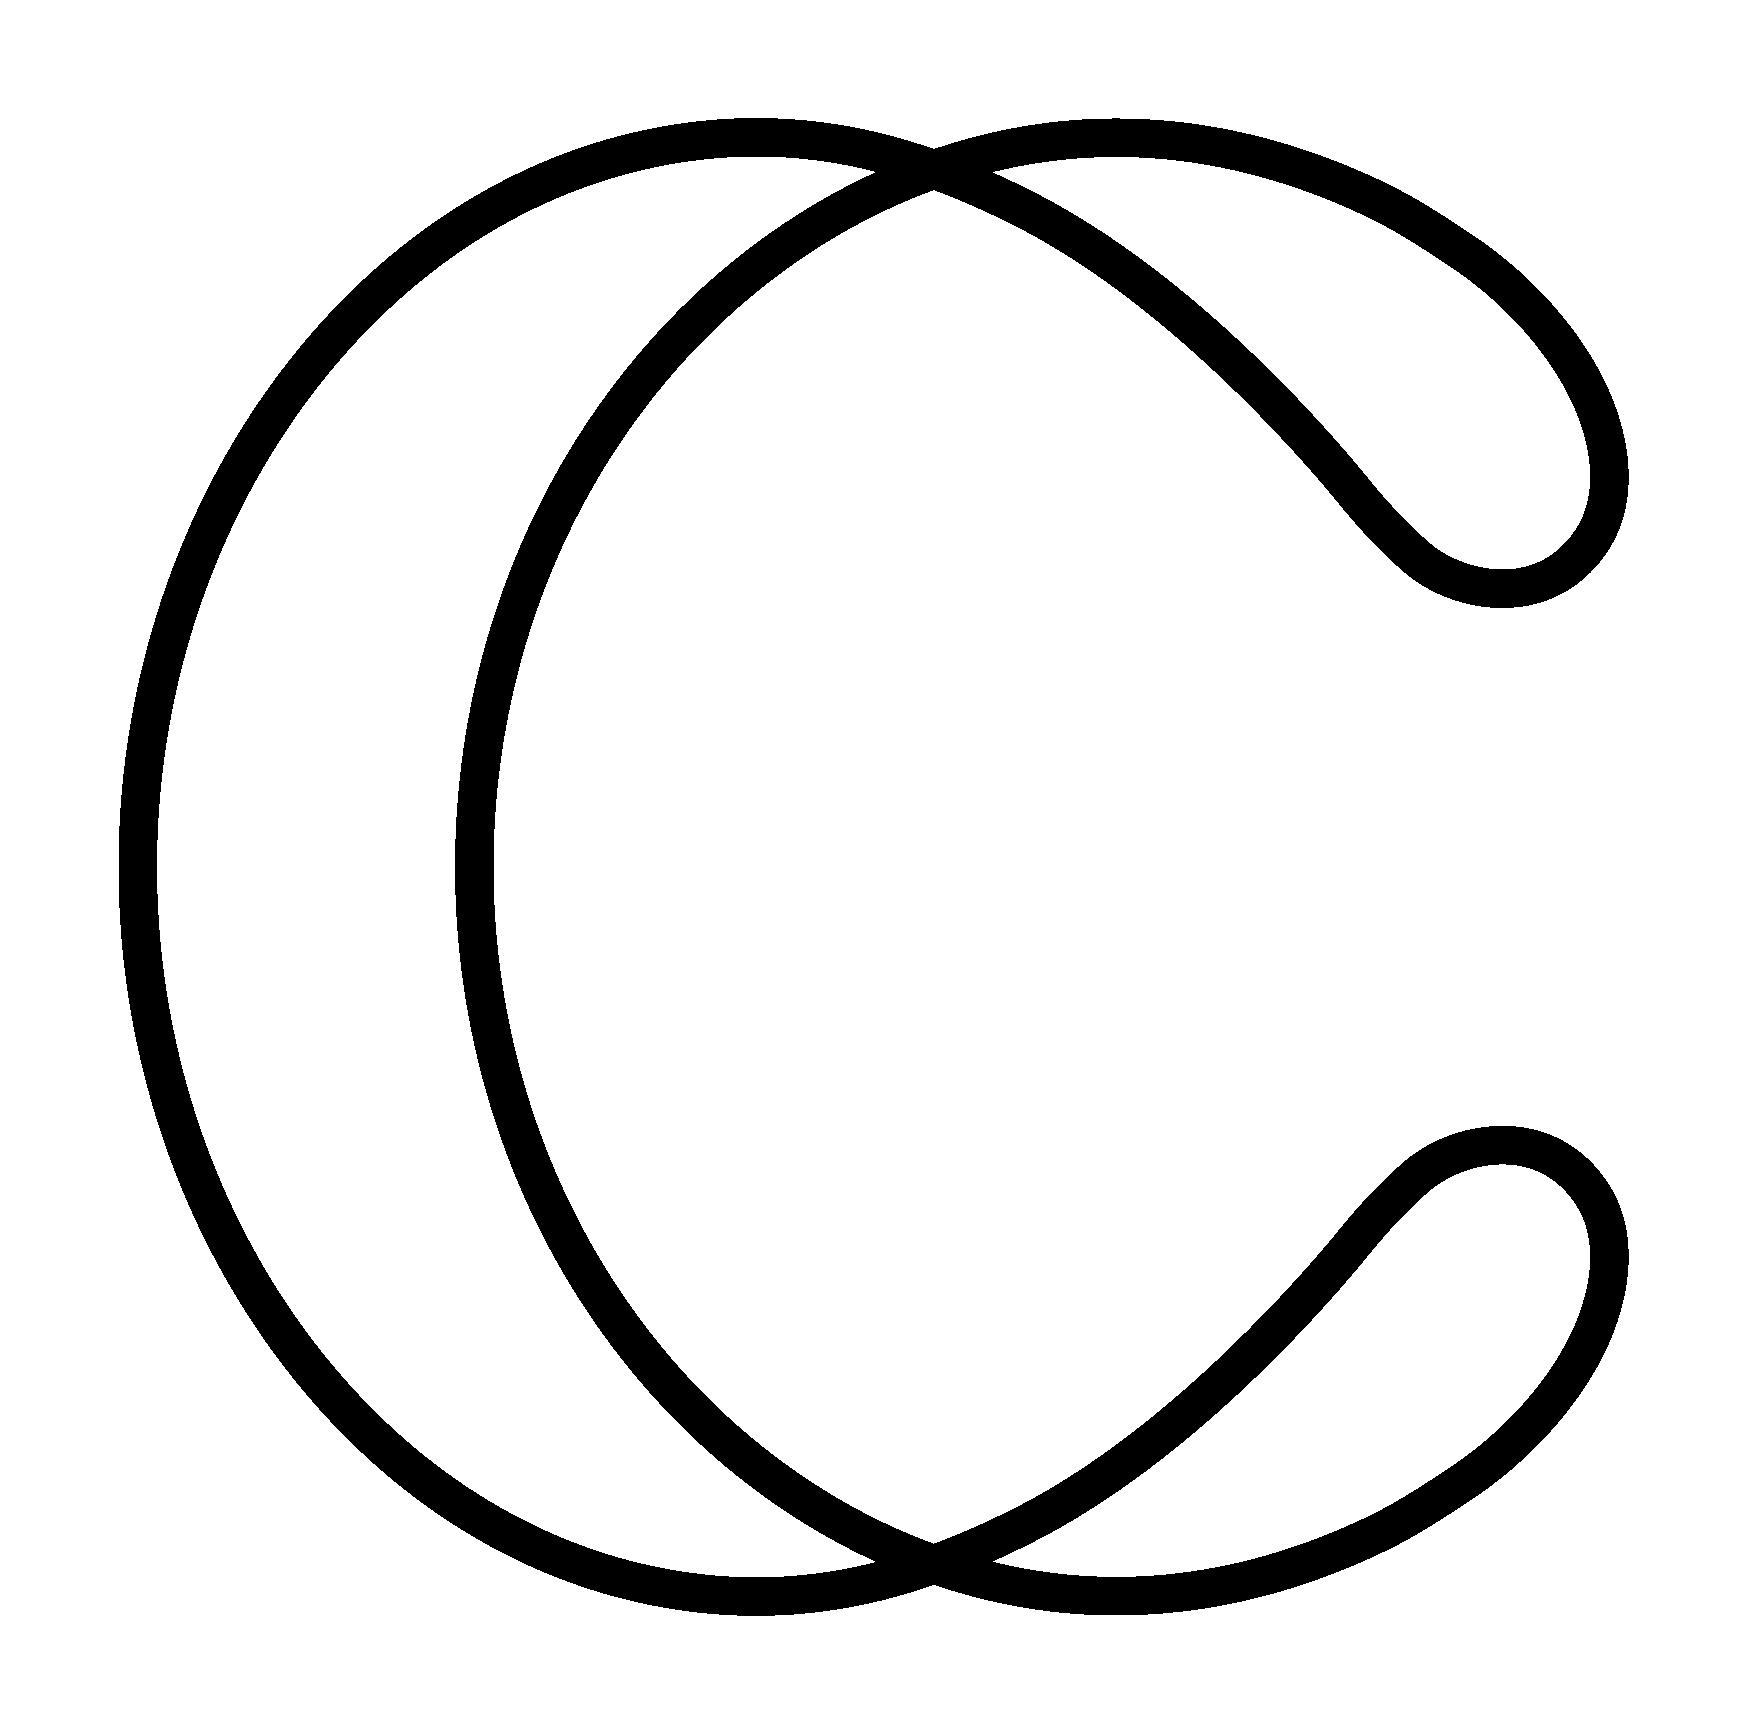 Covariant logo